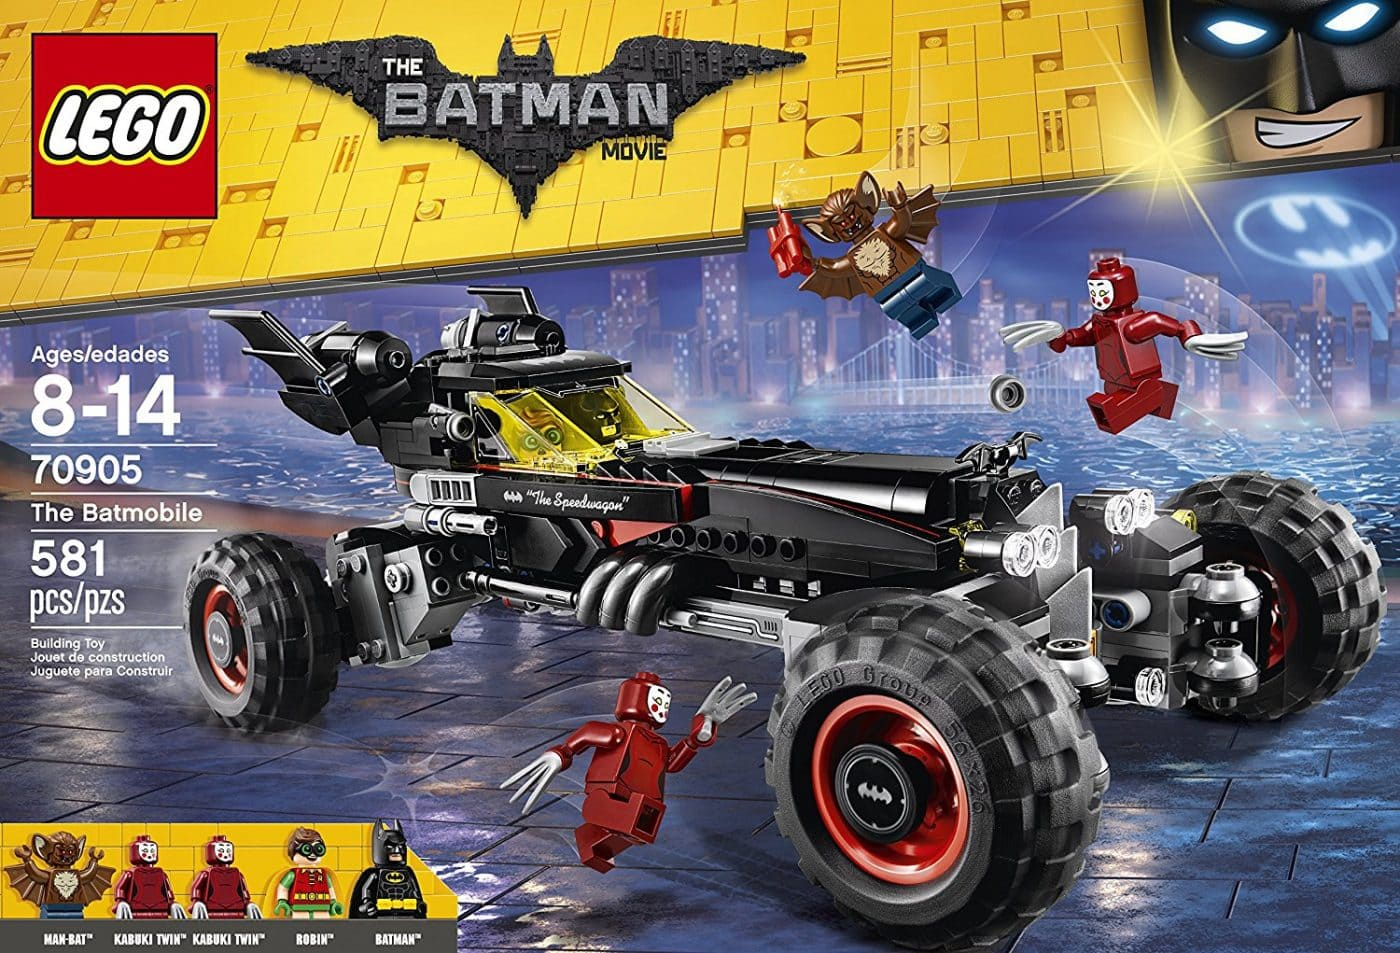 The LEGO Batman Movie Batmobile